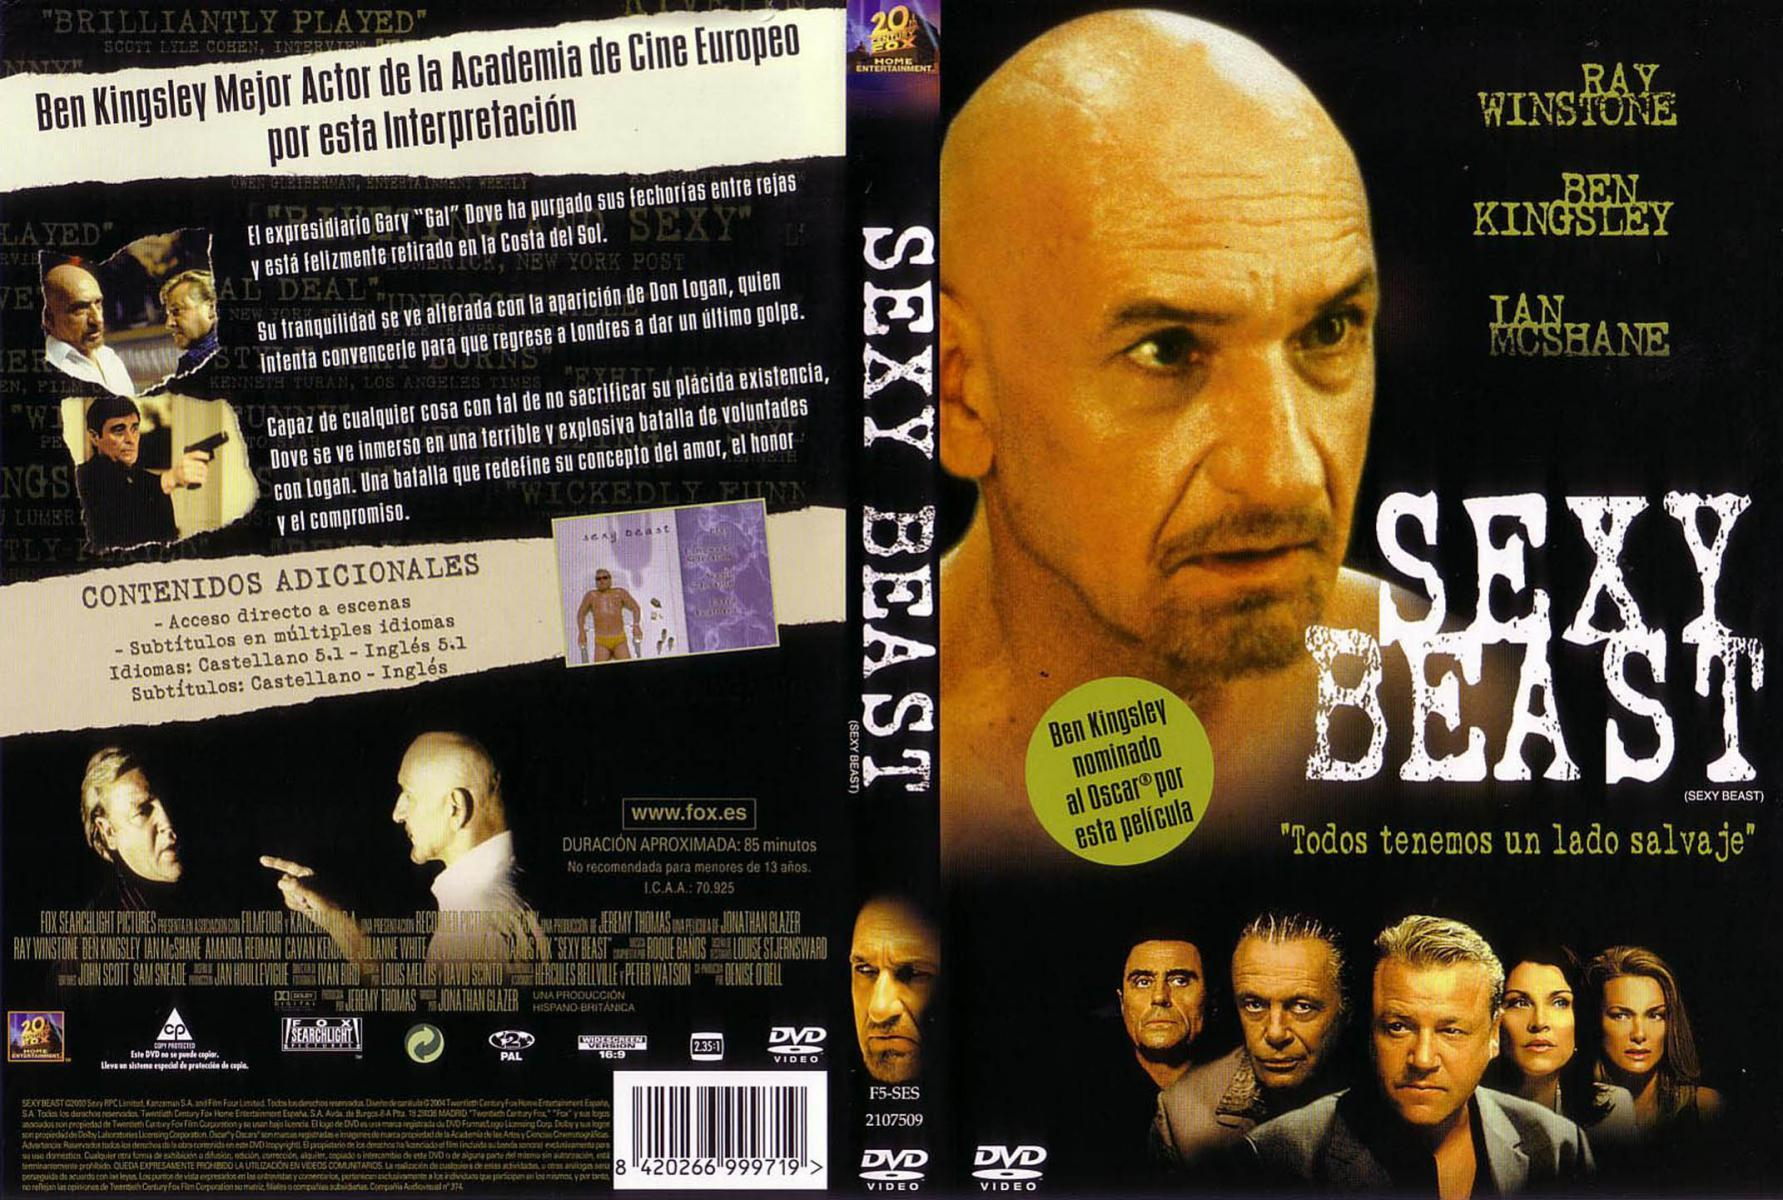 Free Sexy Dvd 42